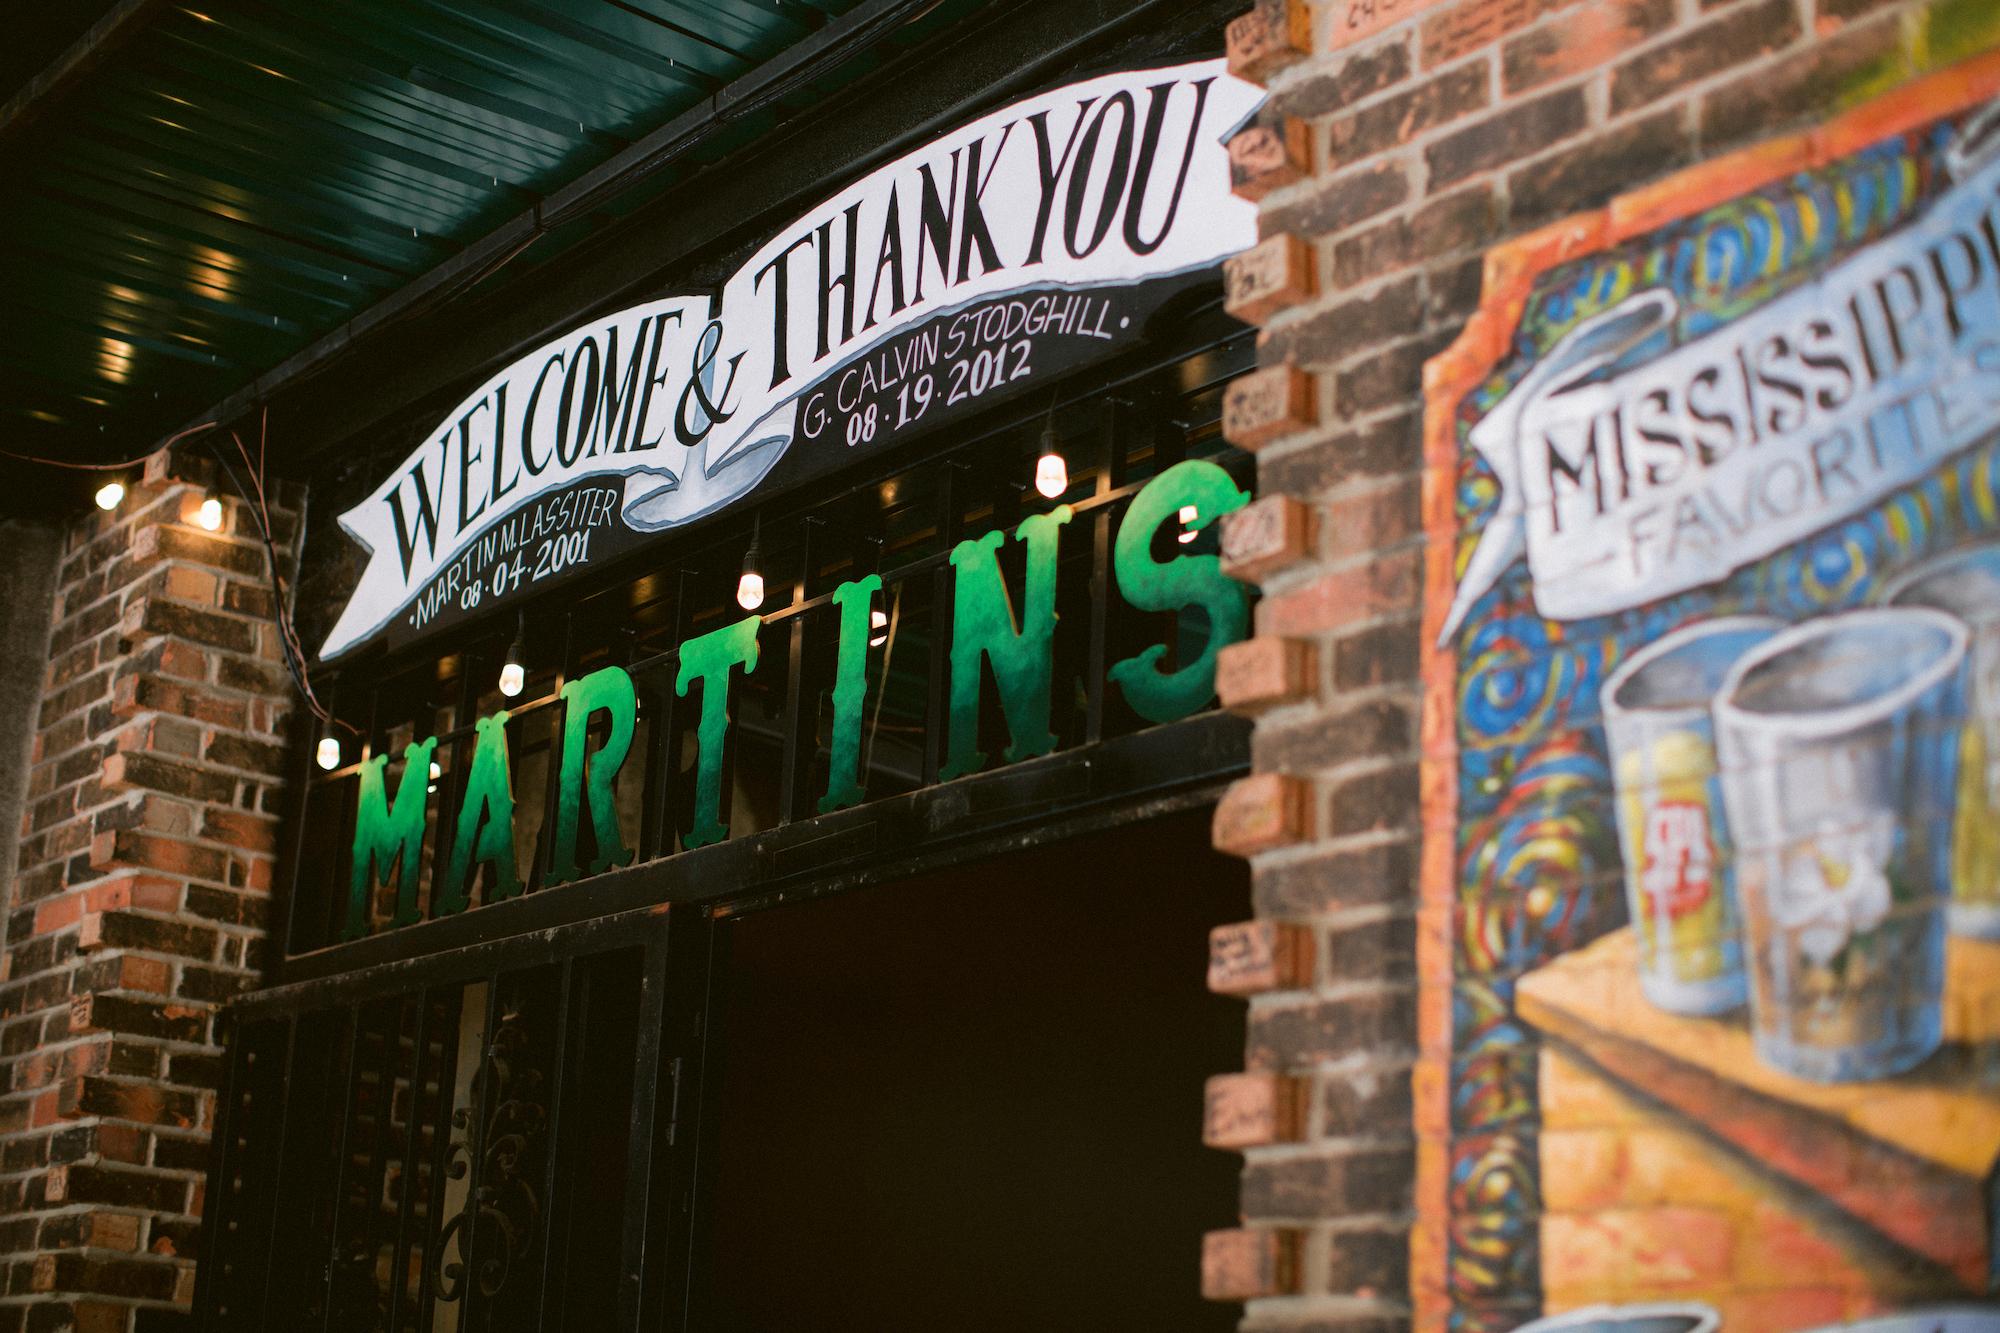 martins-good-grit004.jpg